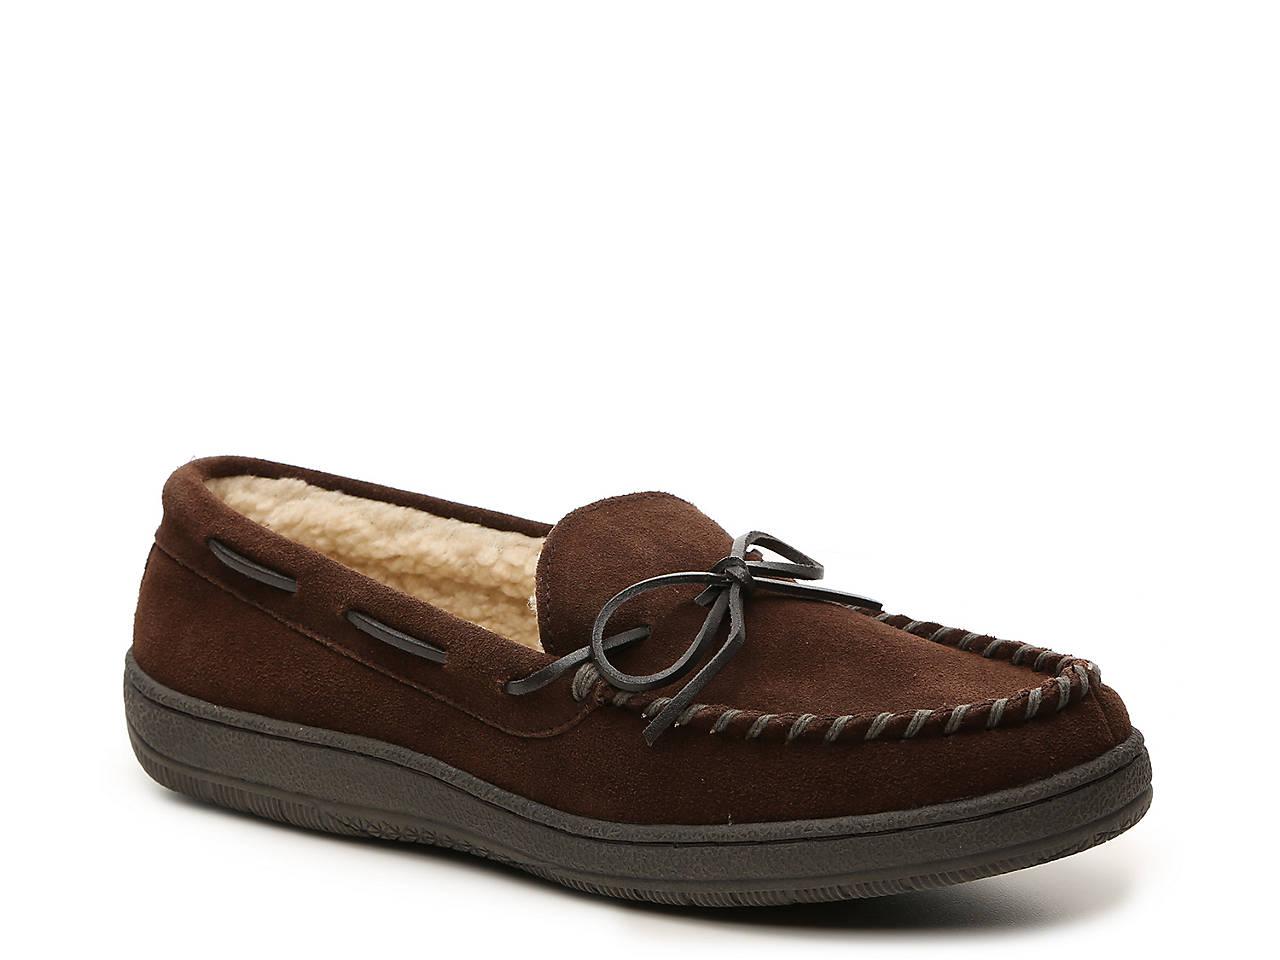 967cd05185d Hideaways by LB Evans Morgan Slipper Men s Shoes